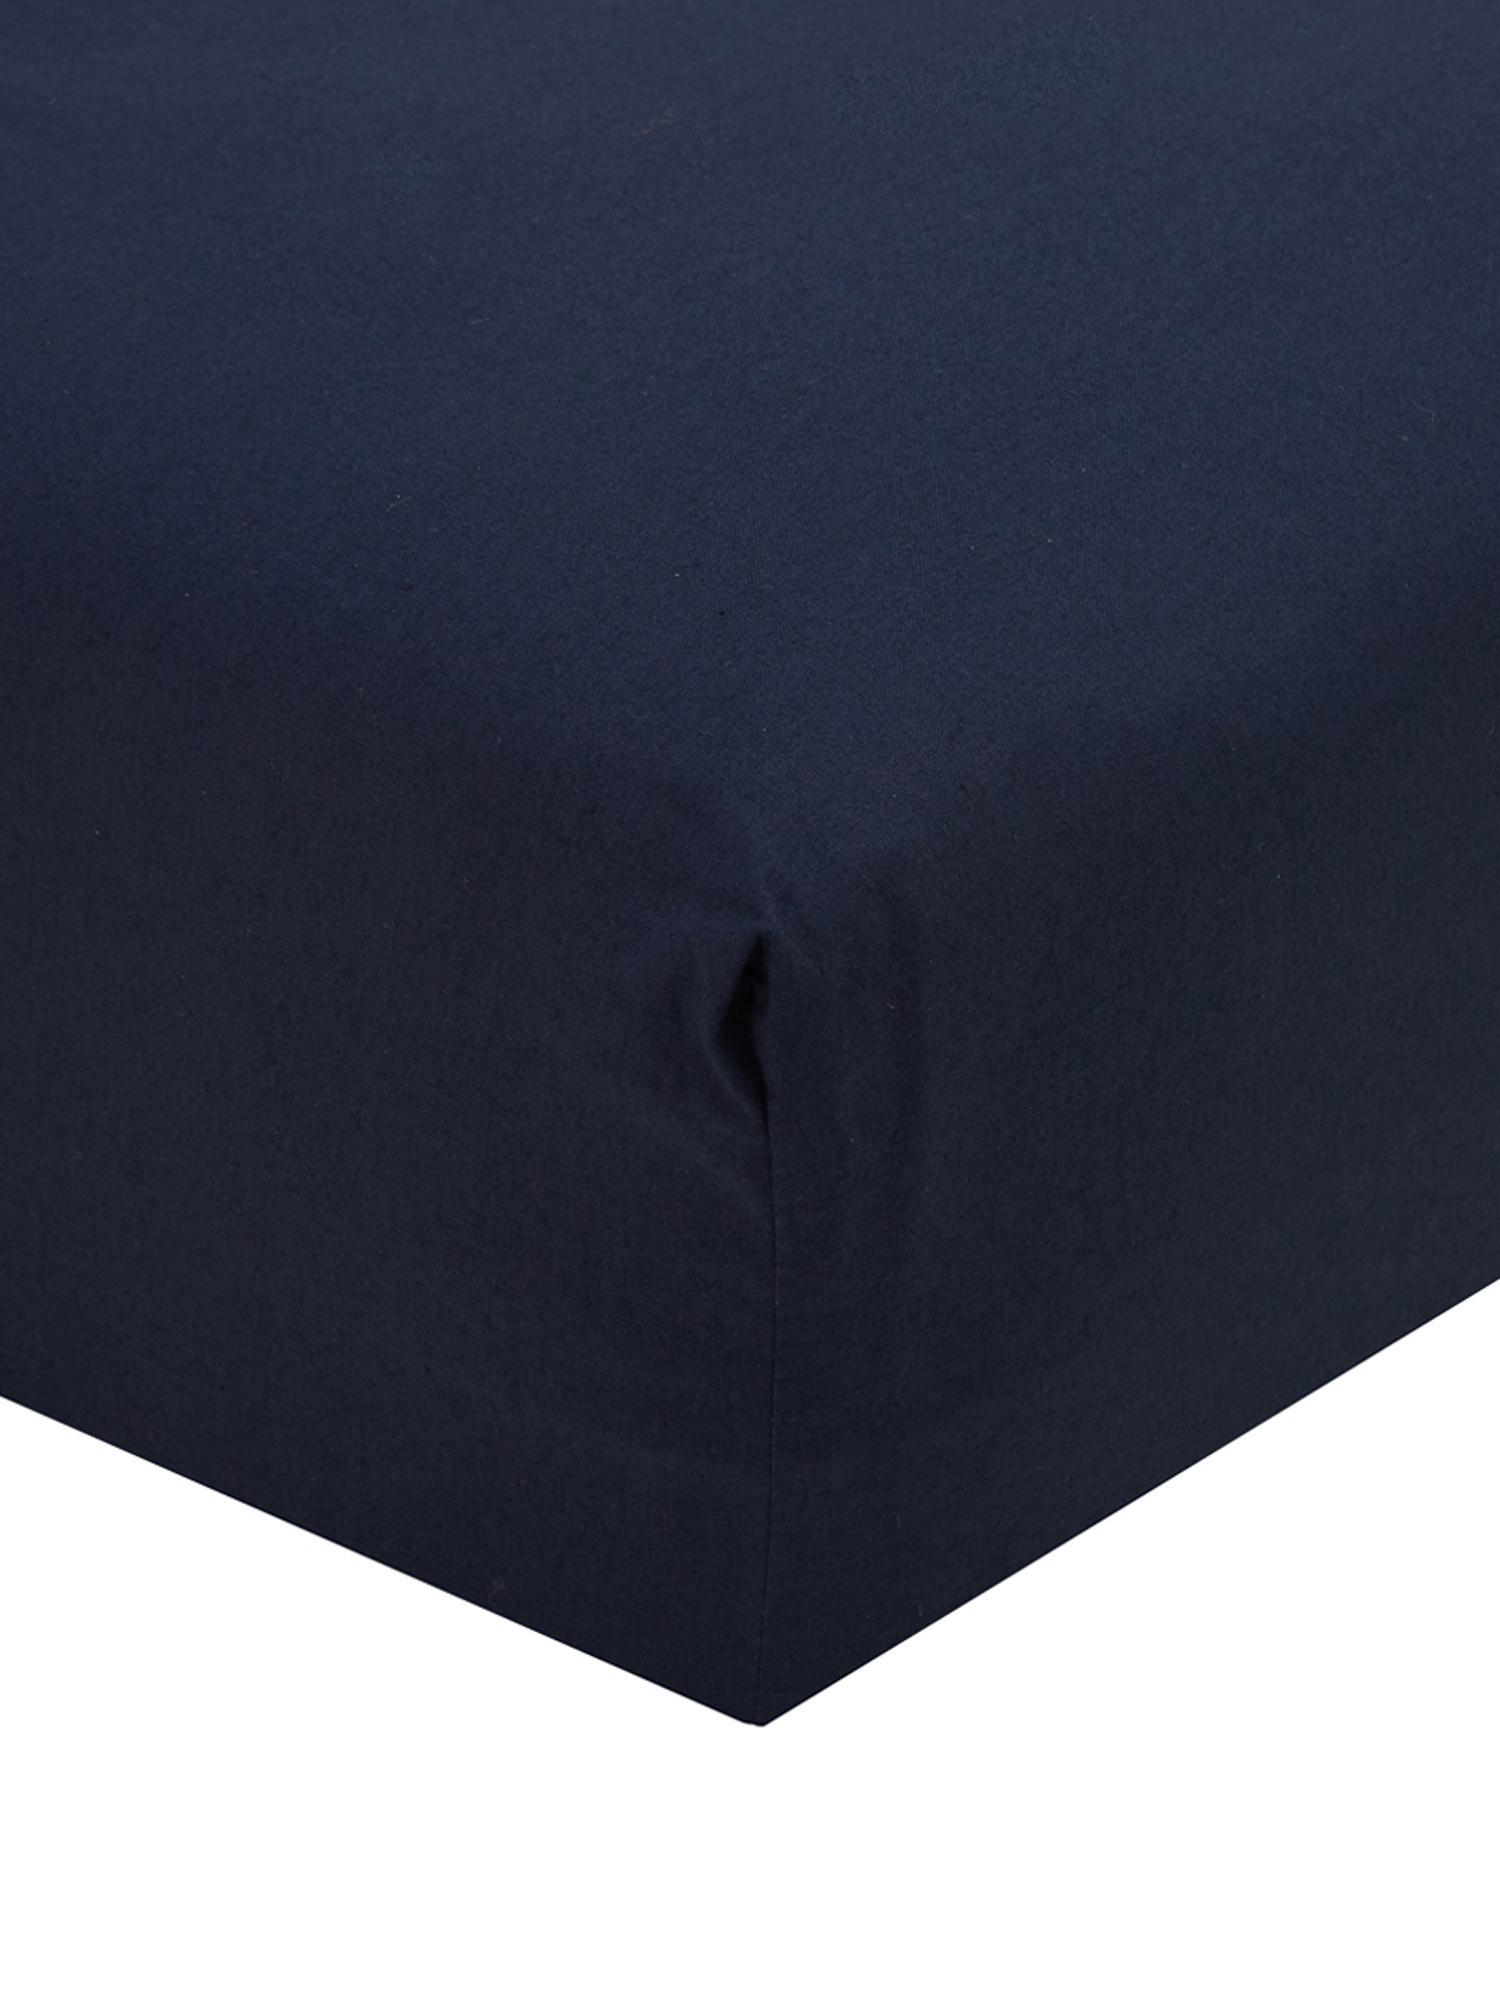 Sábana bajera de percal Elsie, Azul oscuro, Cama 90 cm (90 x 200 cm)